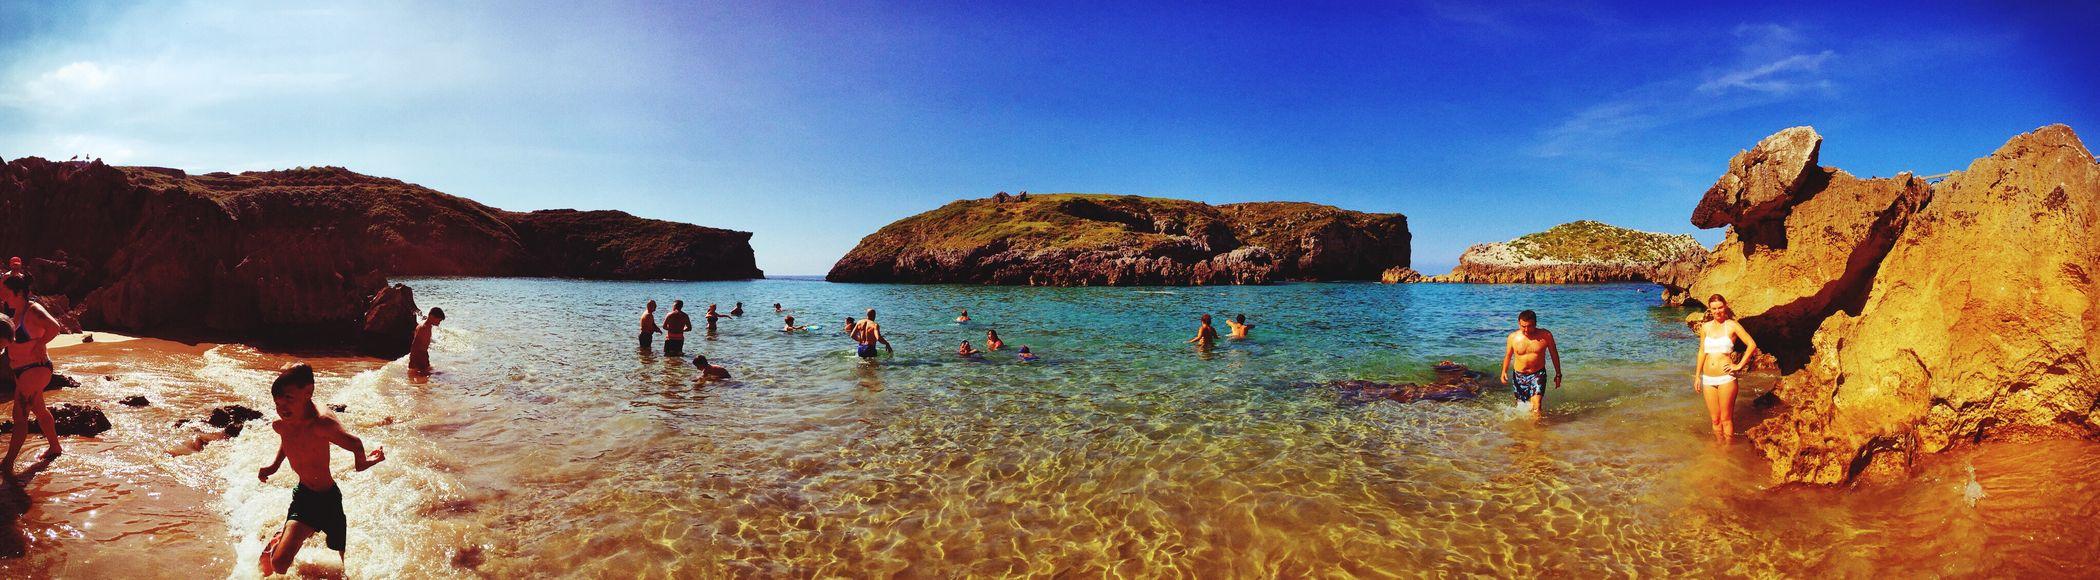 The Great Outdoors - 2015 EyeEm Awards Asturias Swimming Sea Sunshine Enjoying The Sun SPAIN